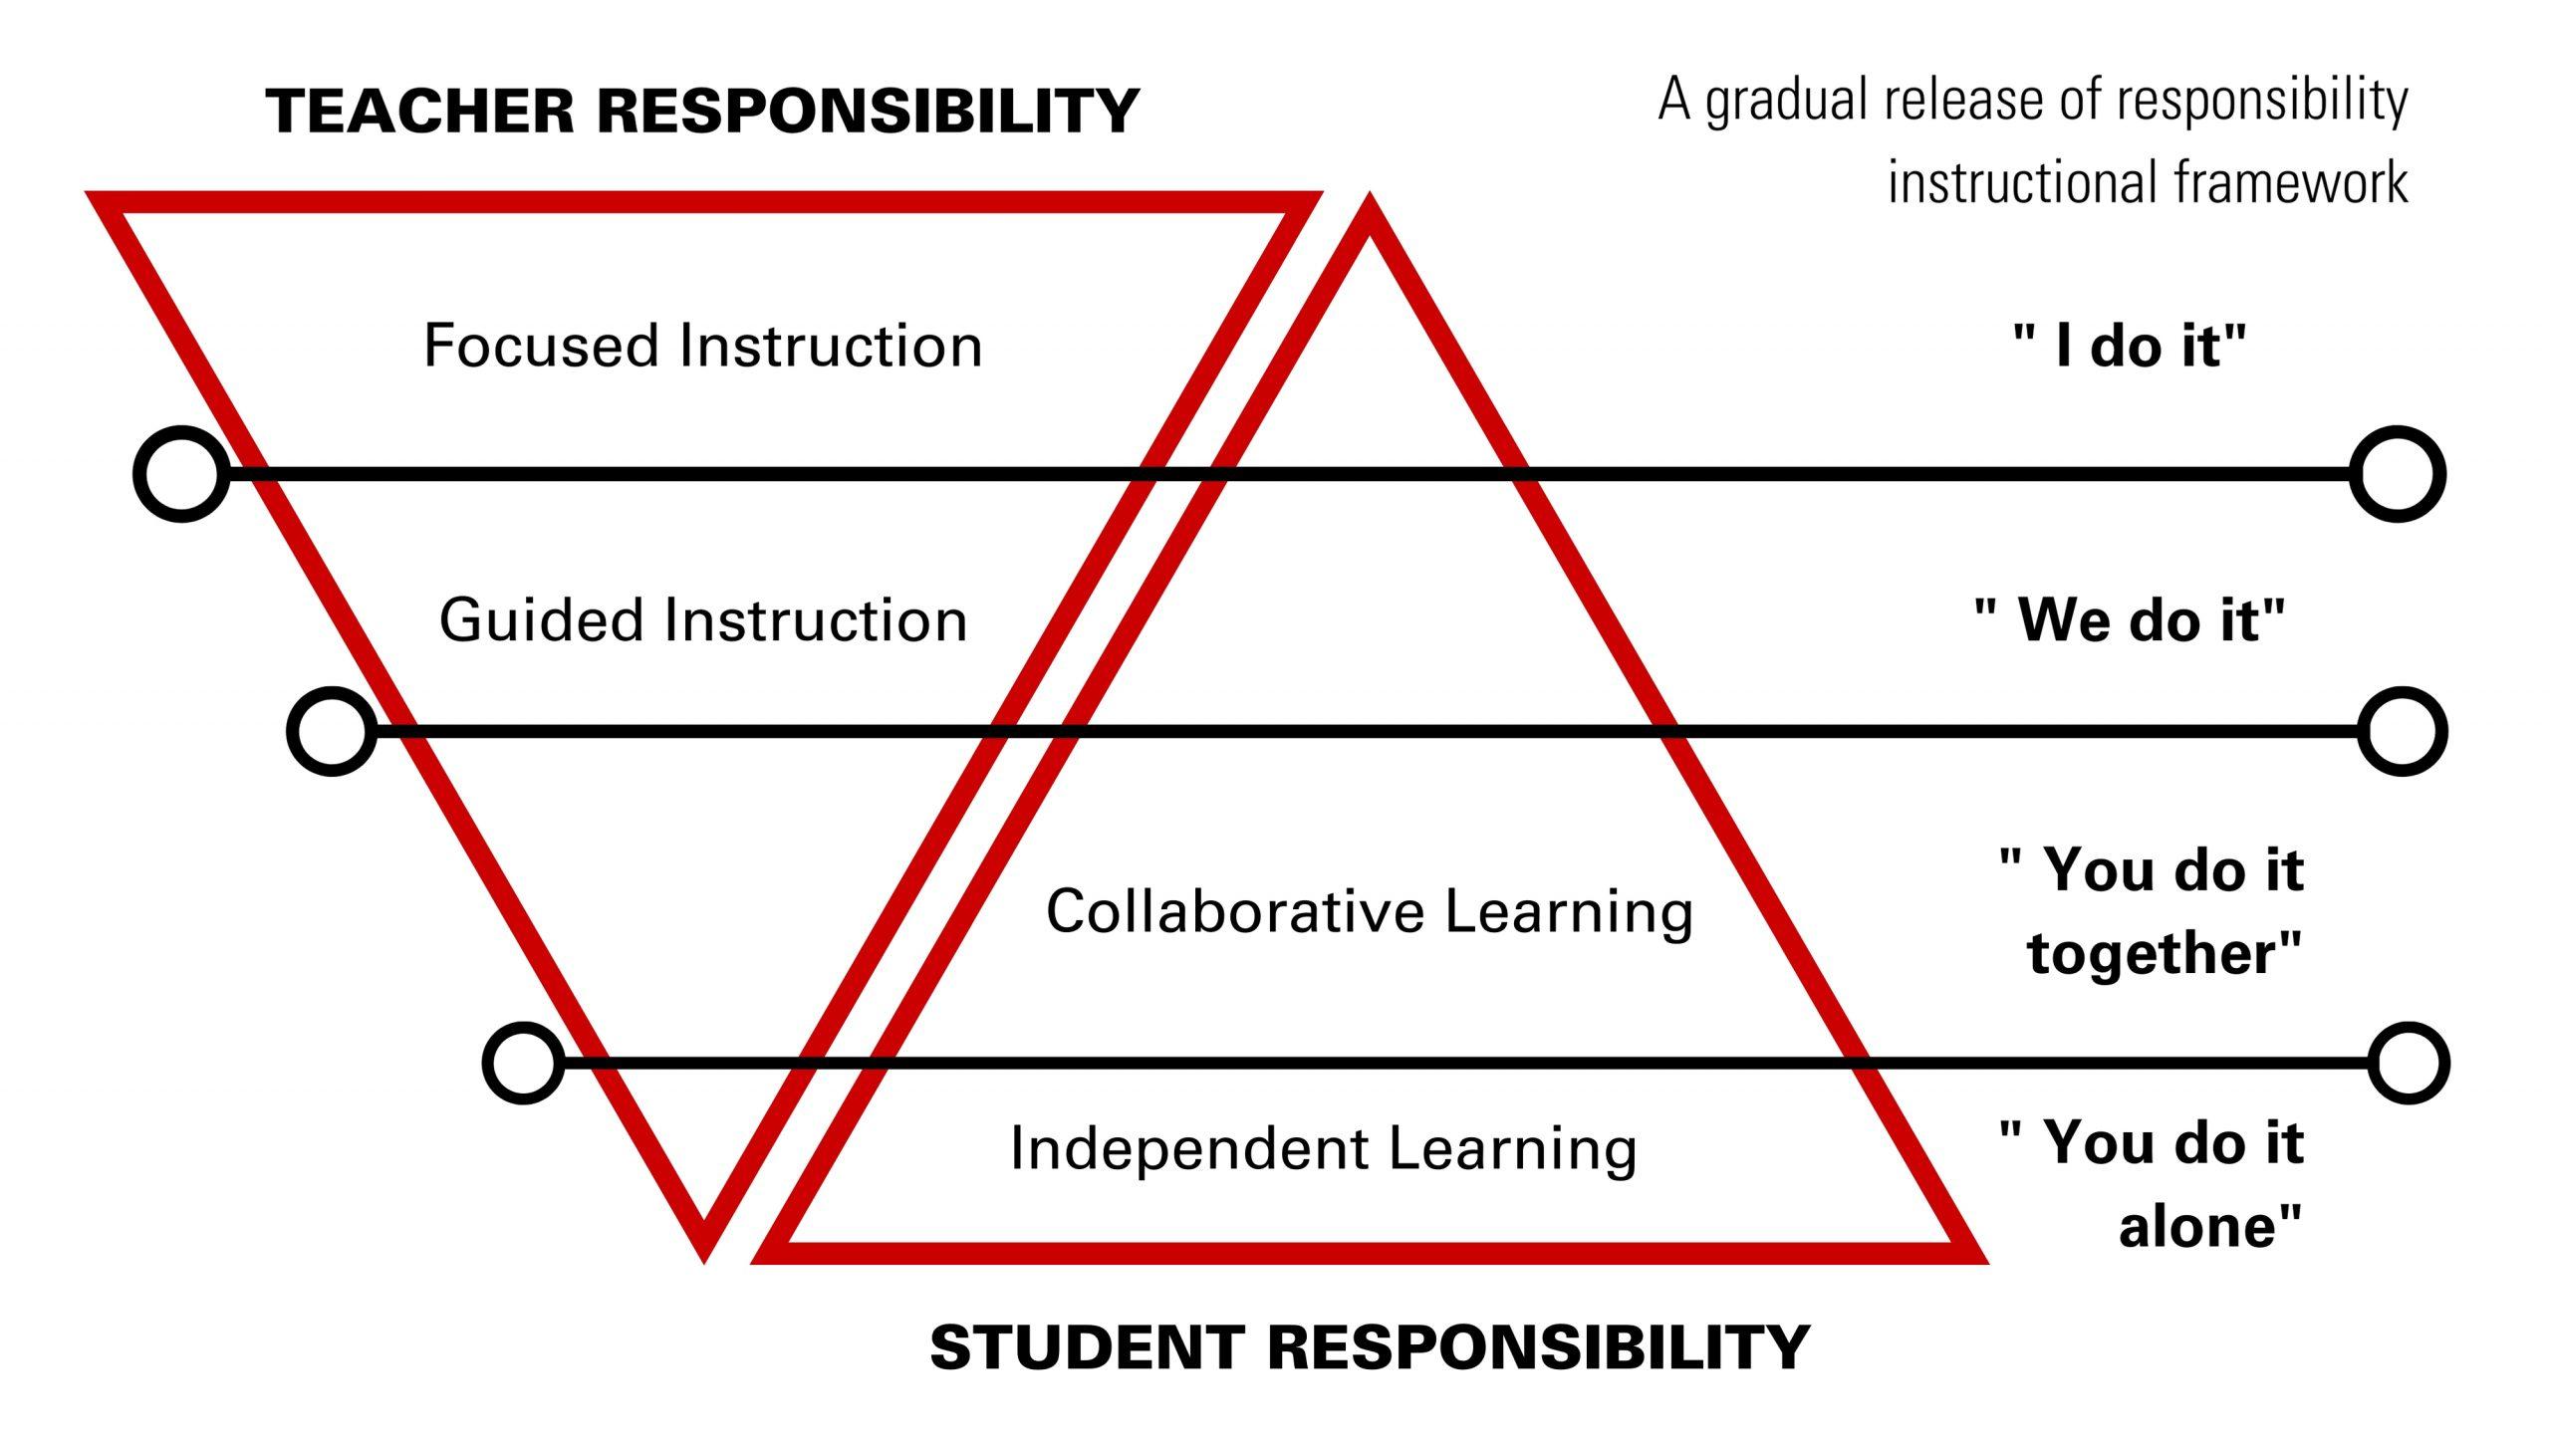 gradual release of responsibility instructional framework